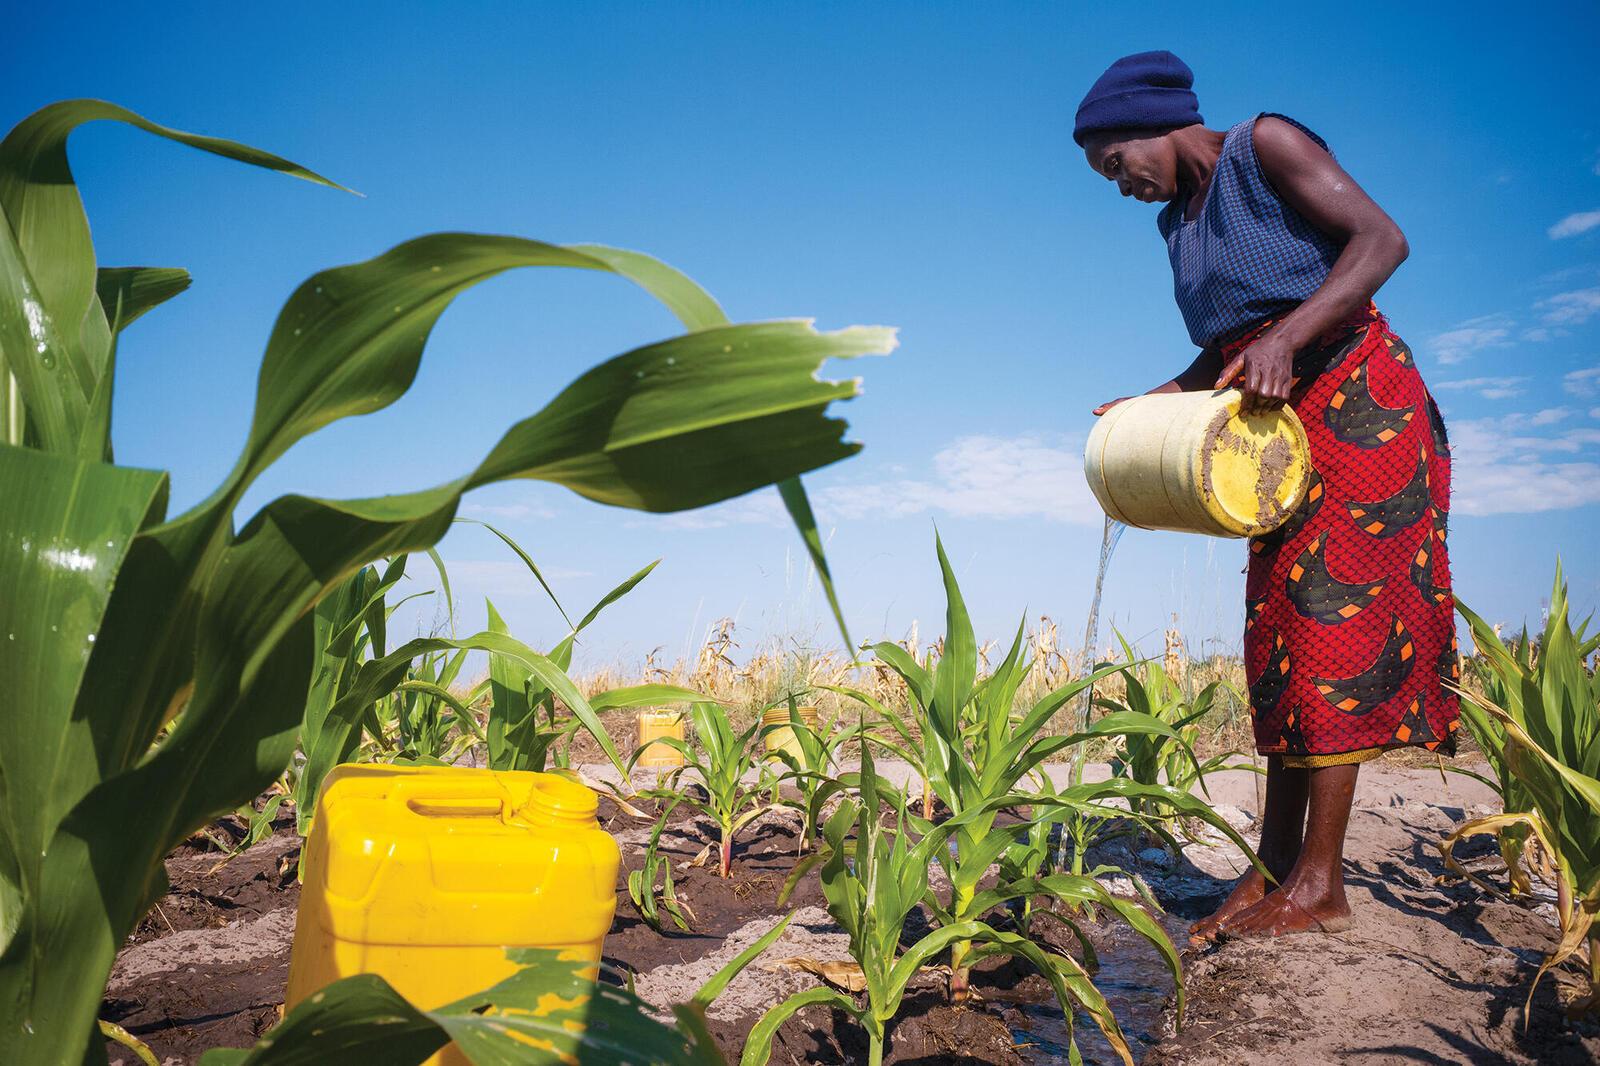 Zambian farmer pouring water over crops